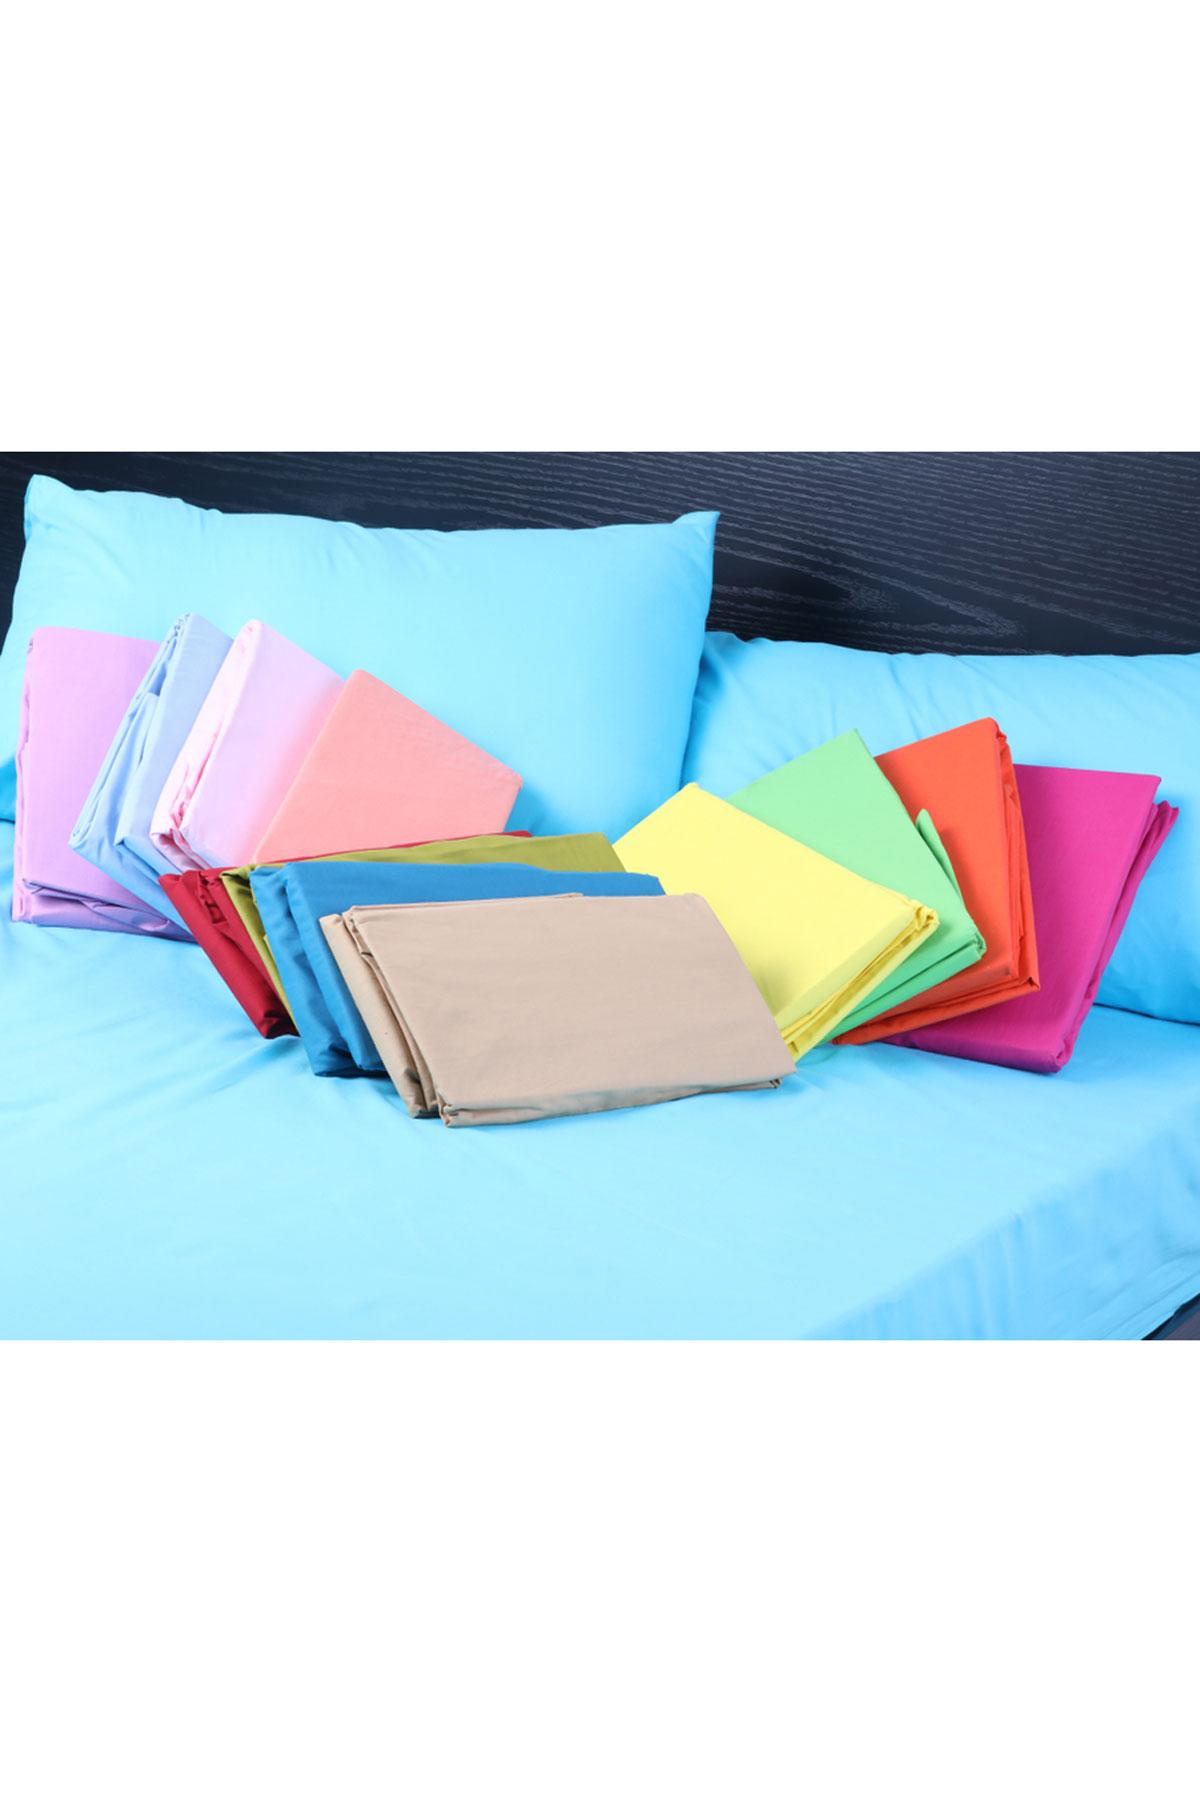 Cotton Hoisery Elastic Double Bed Sheet- 180×200 cm